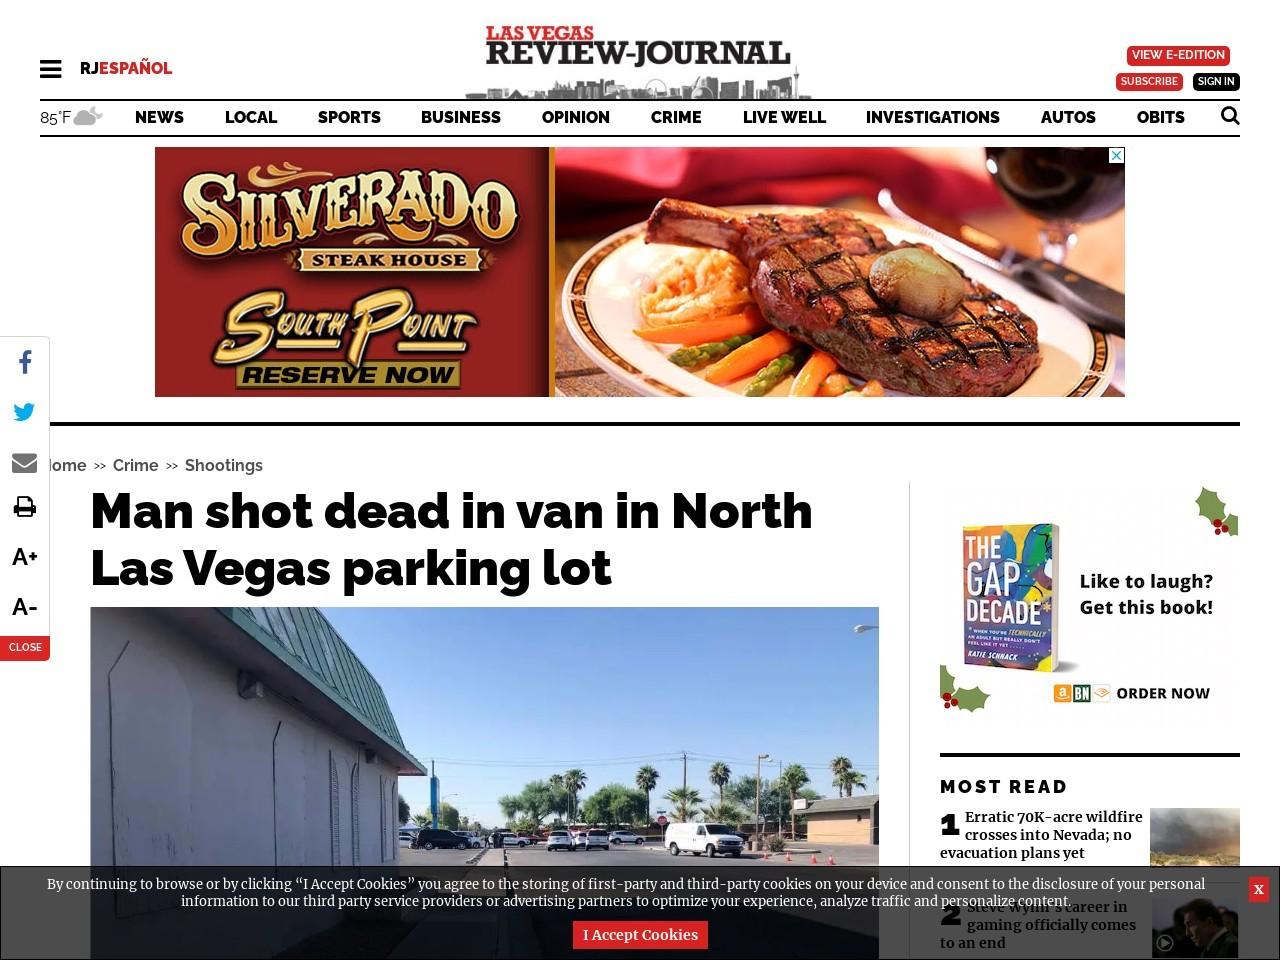 Man shot dead in van in North Las Vegas parking lot